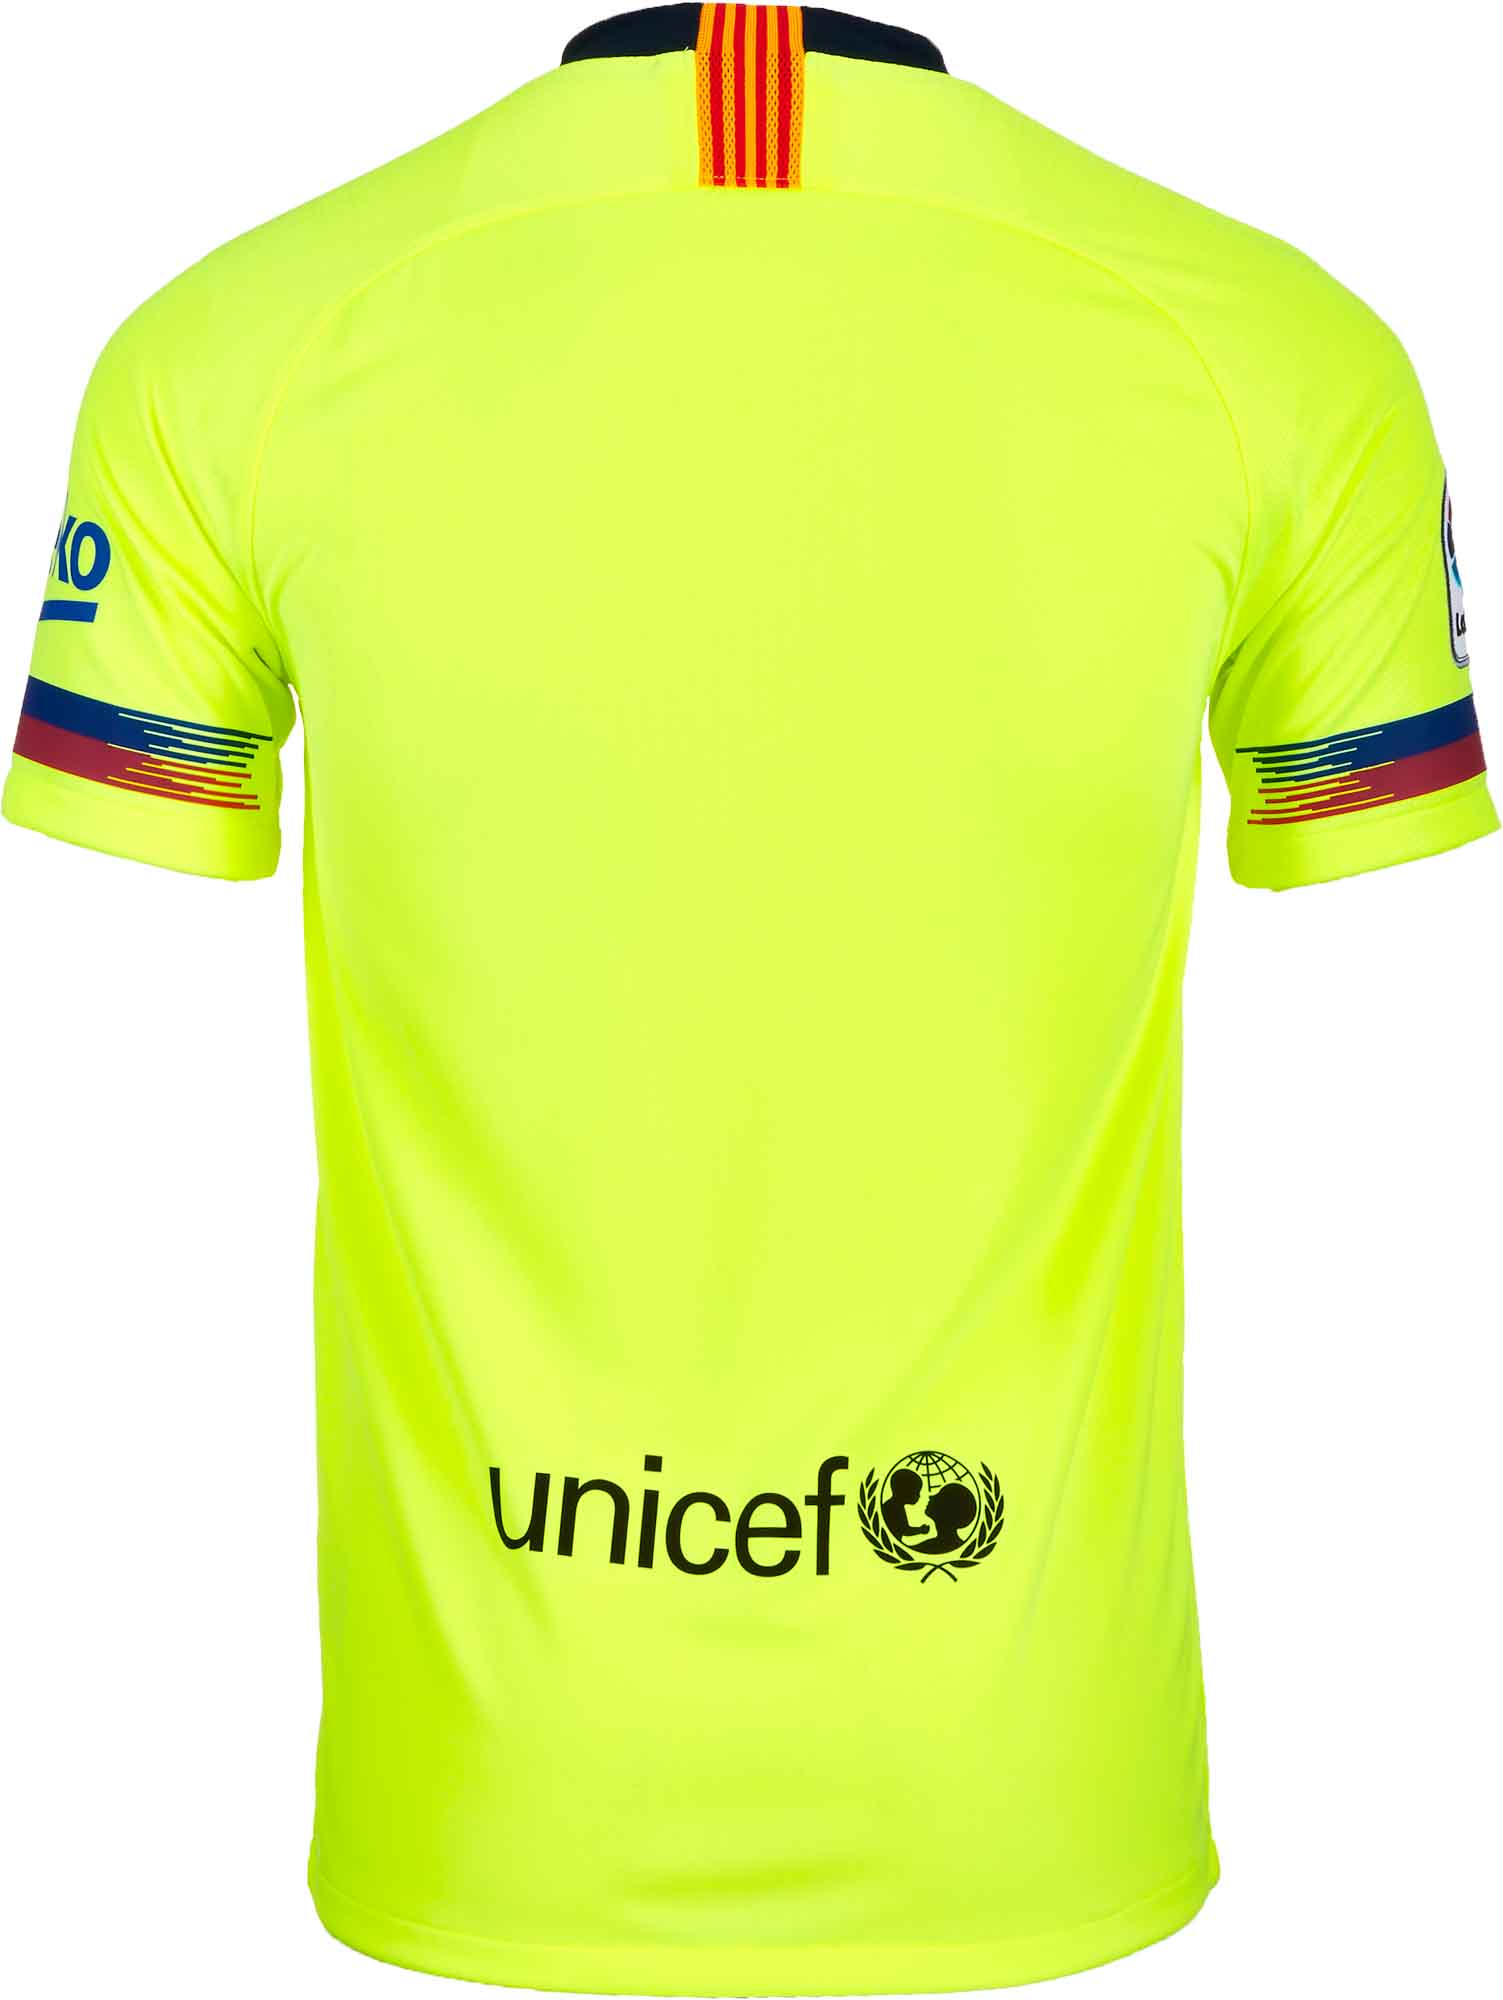 super popular c7596 5290e Nike Barcelona Away Jersey - Youth - Volt/Deep Royal Blue - SoccerPro